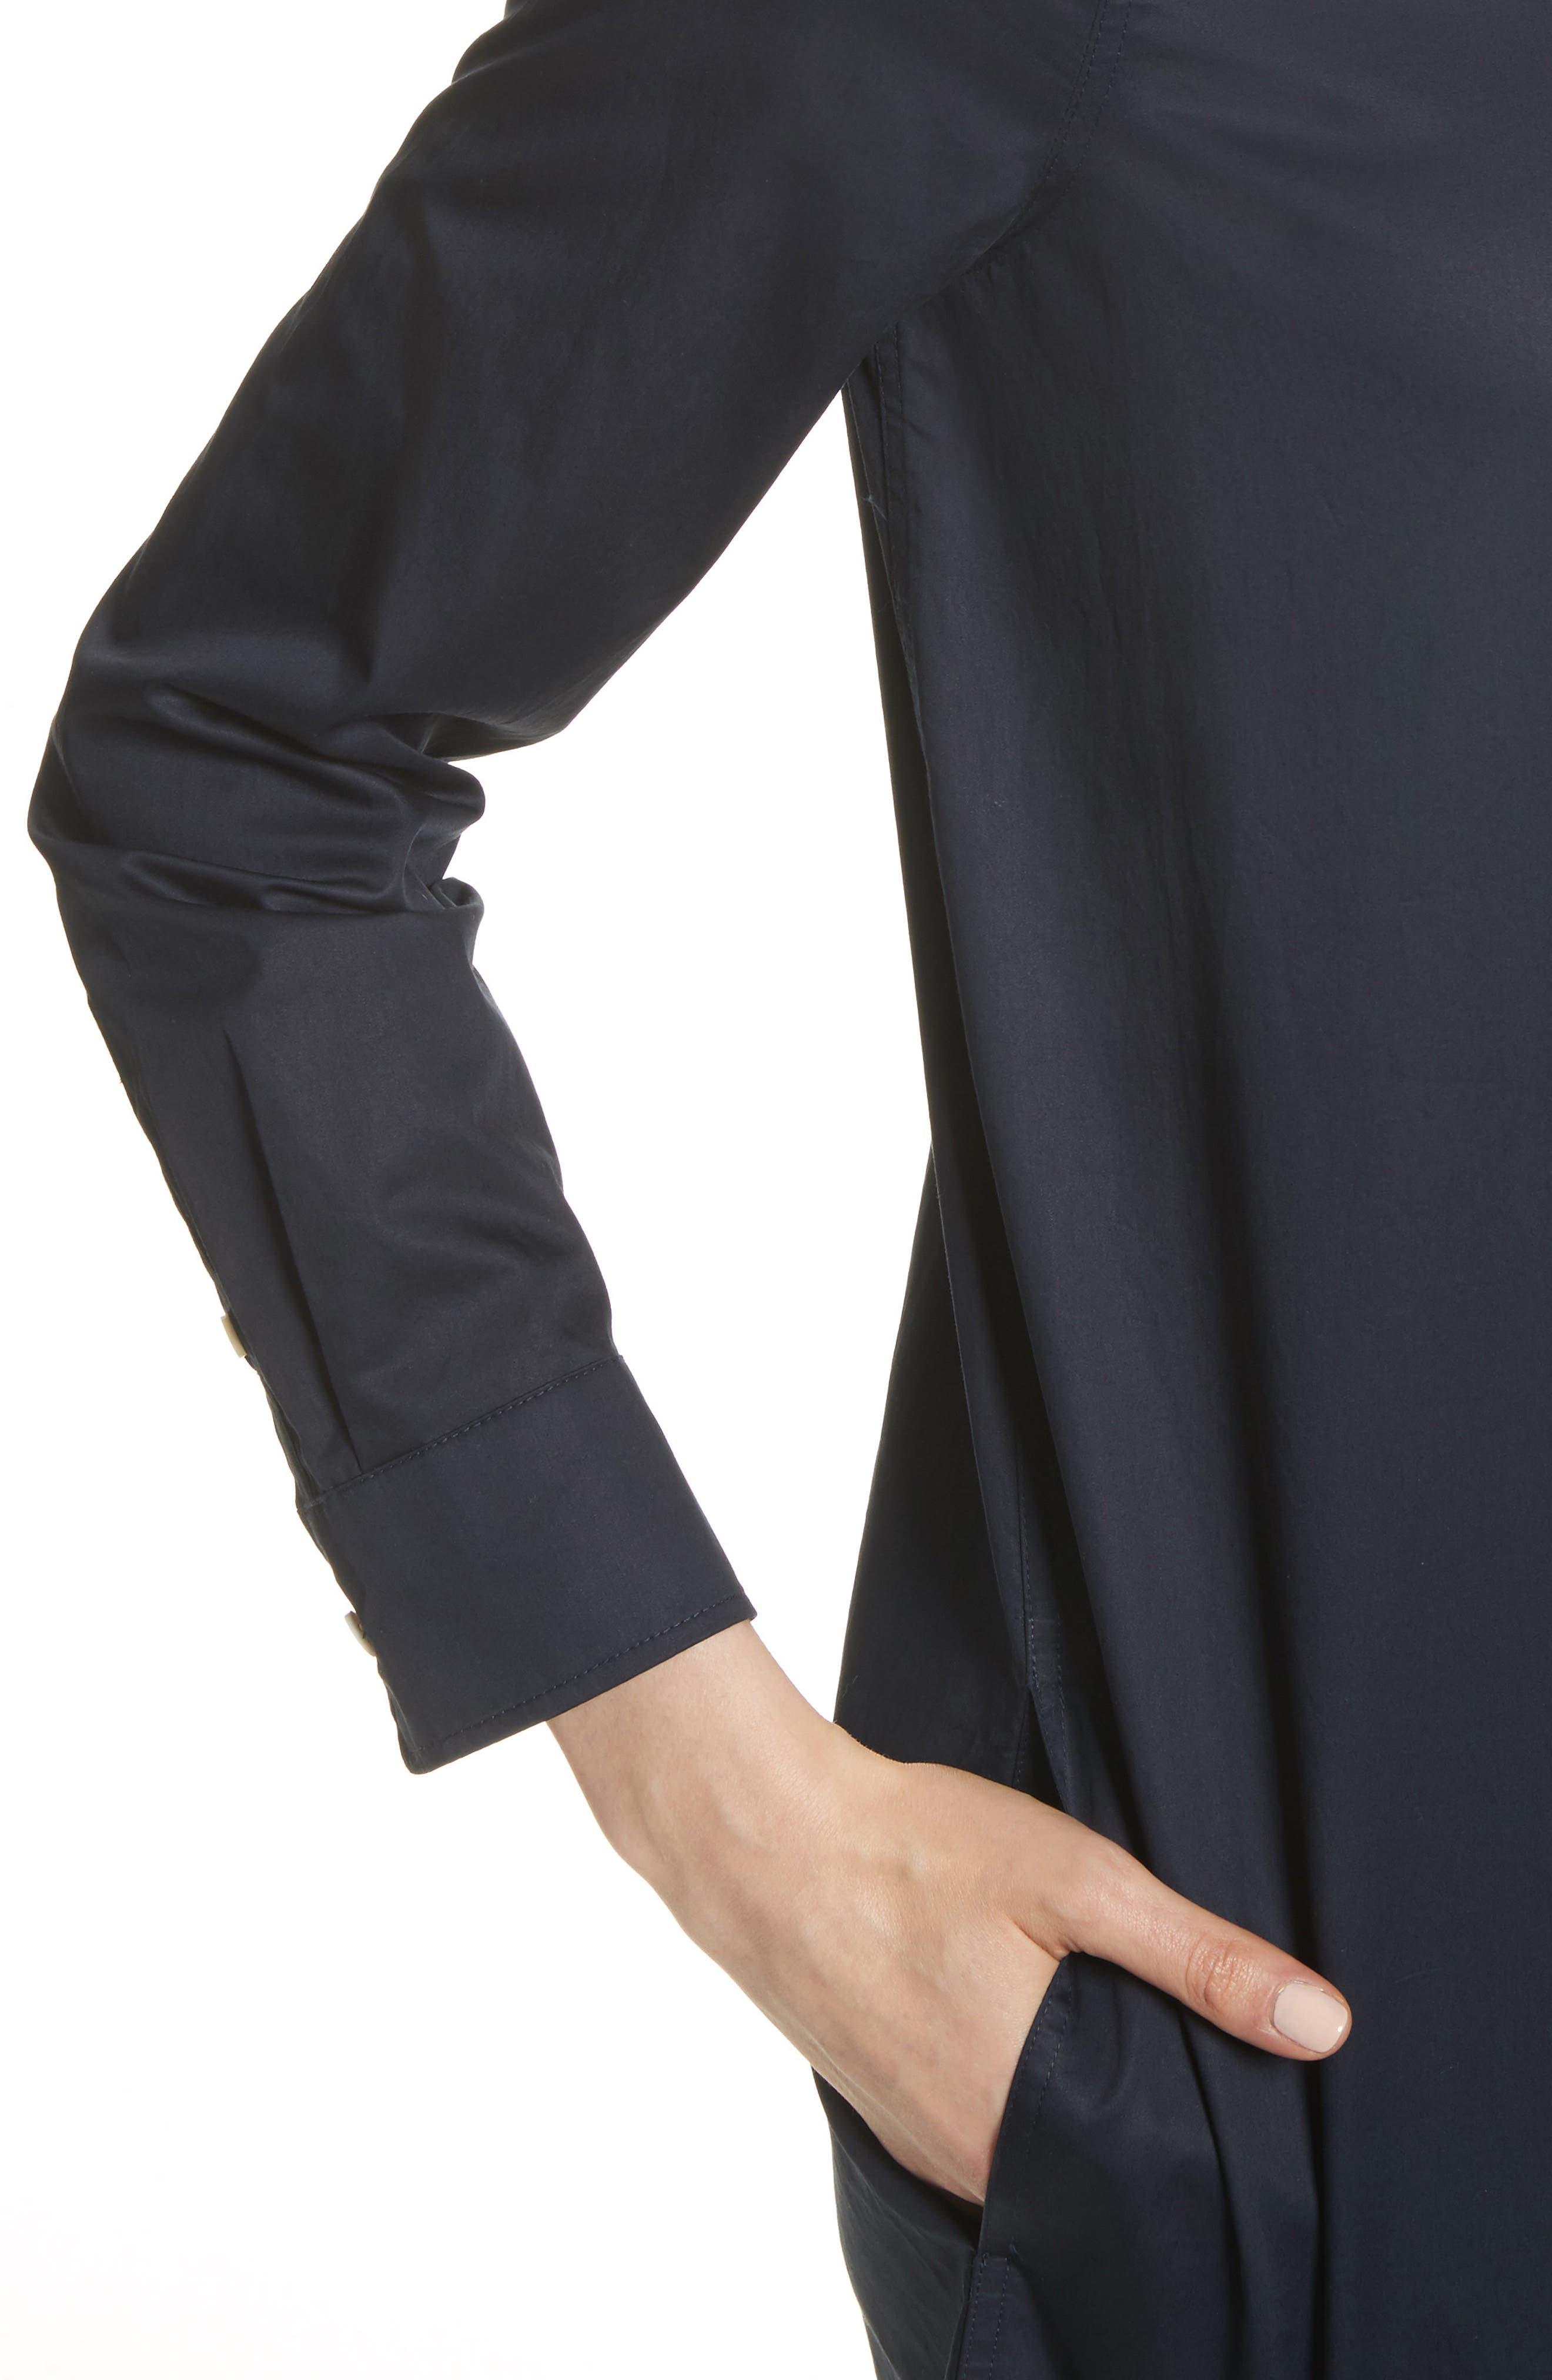 Carmine Cotton Shirtdress,                             Alternate thumbnail 4, color,                             005